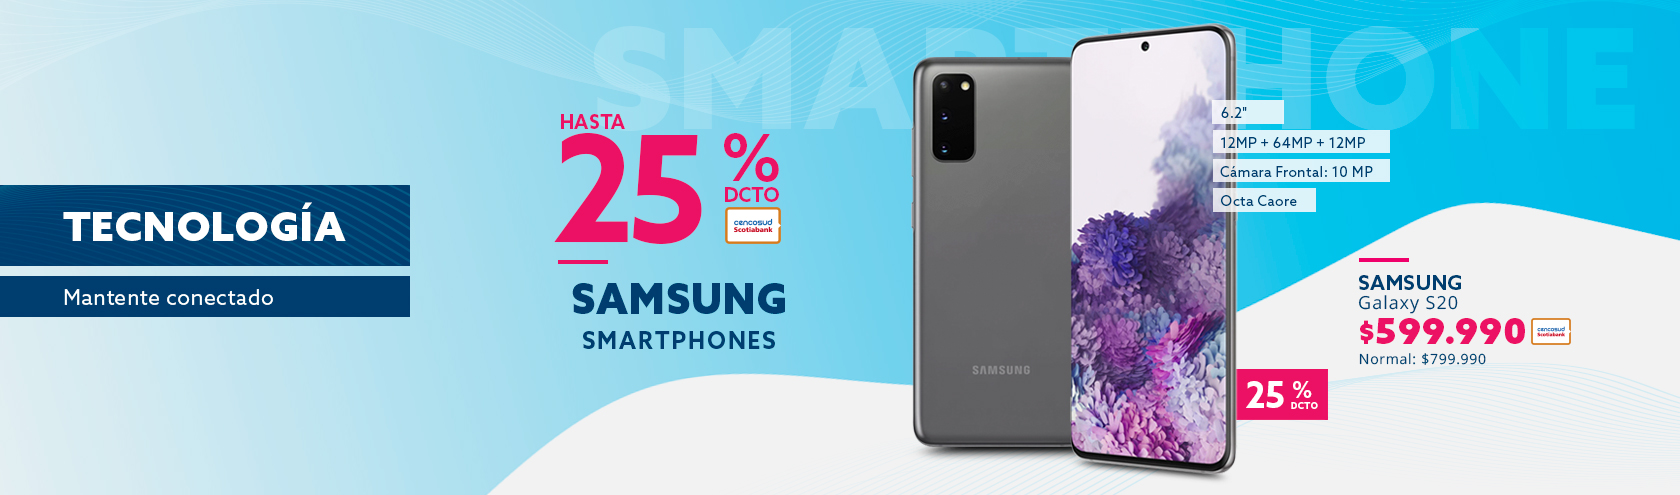 Samsung Galaxy S20 a $599.990